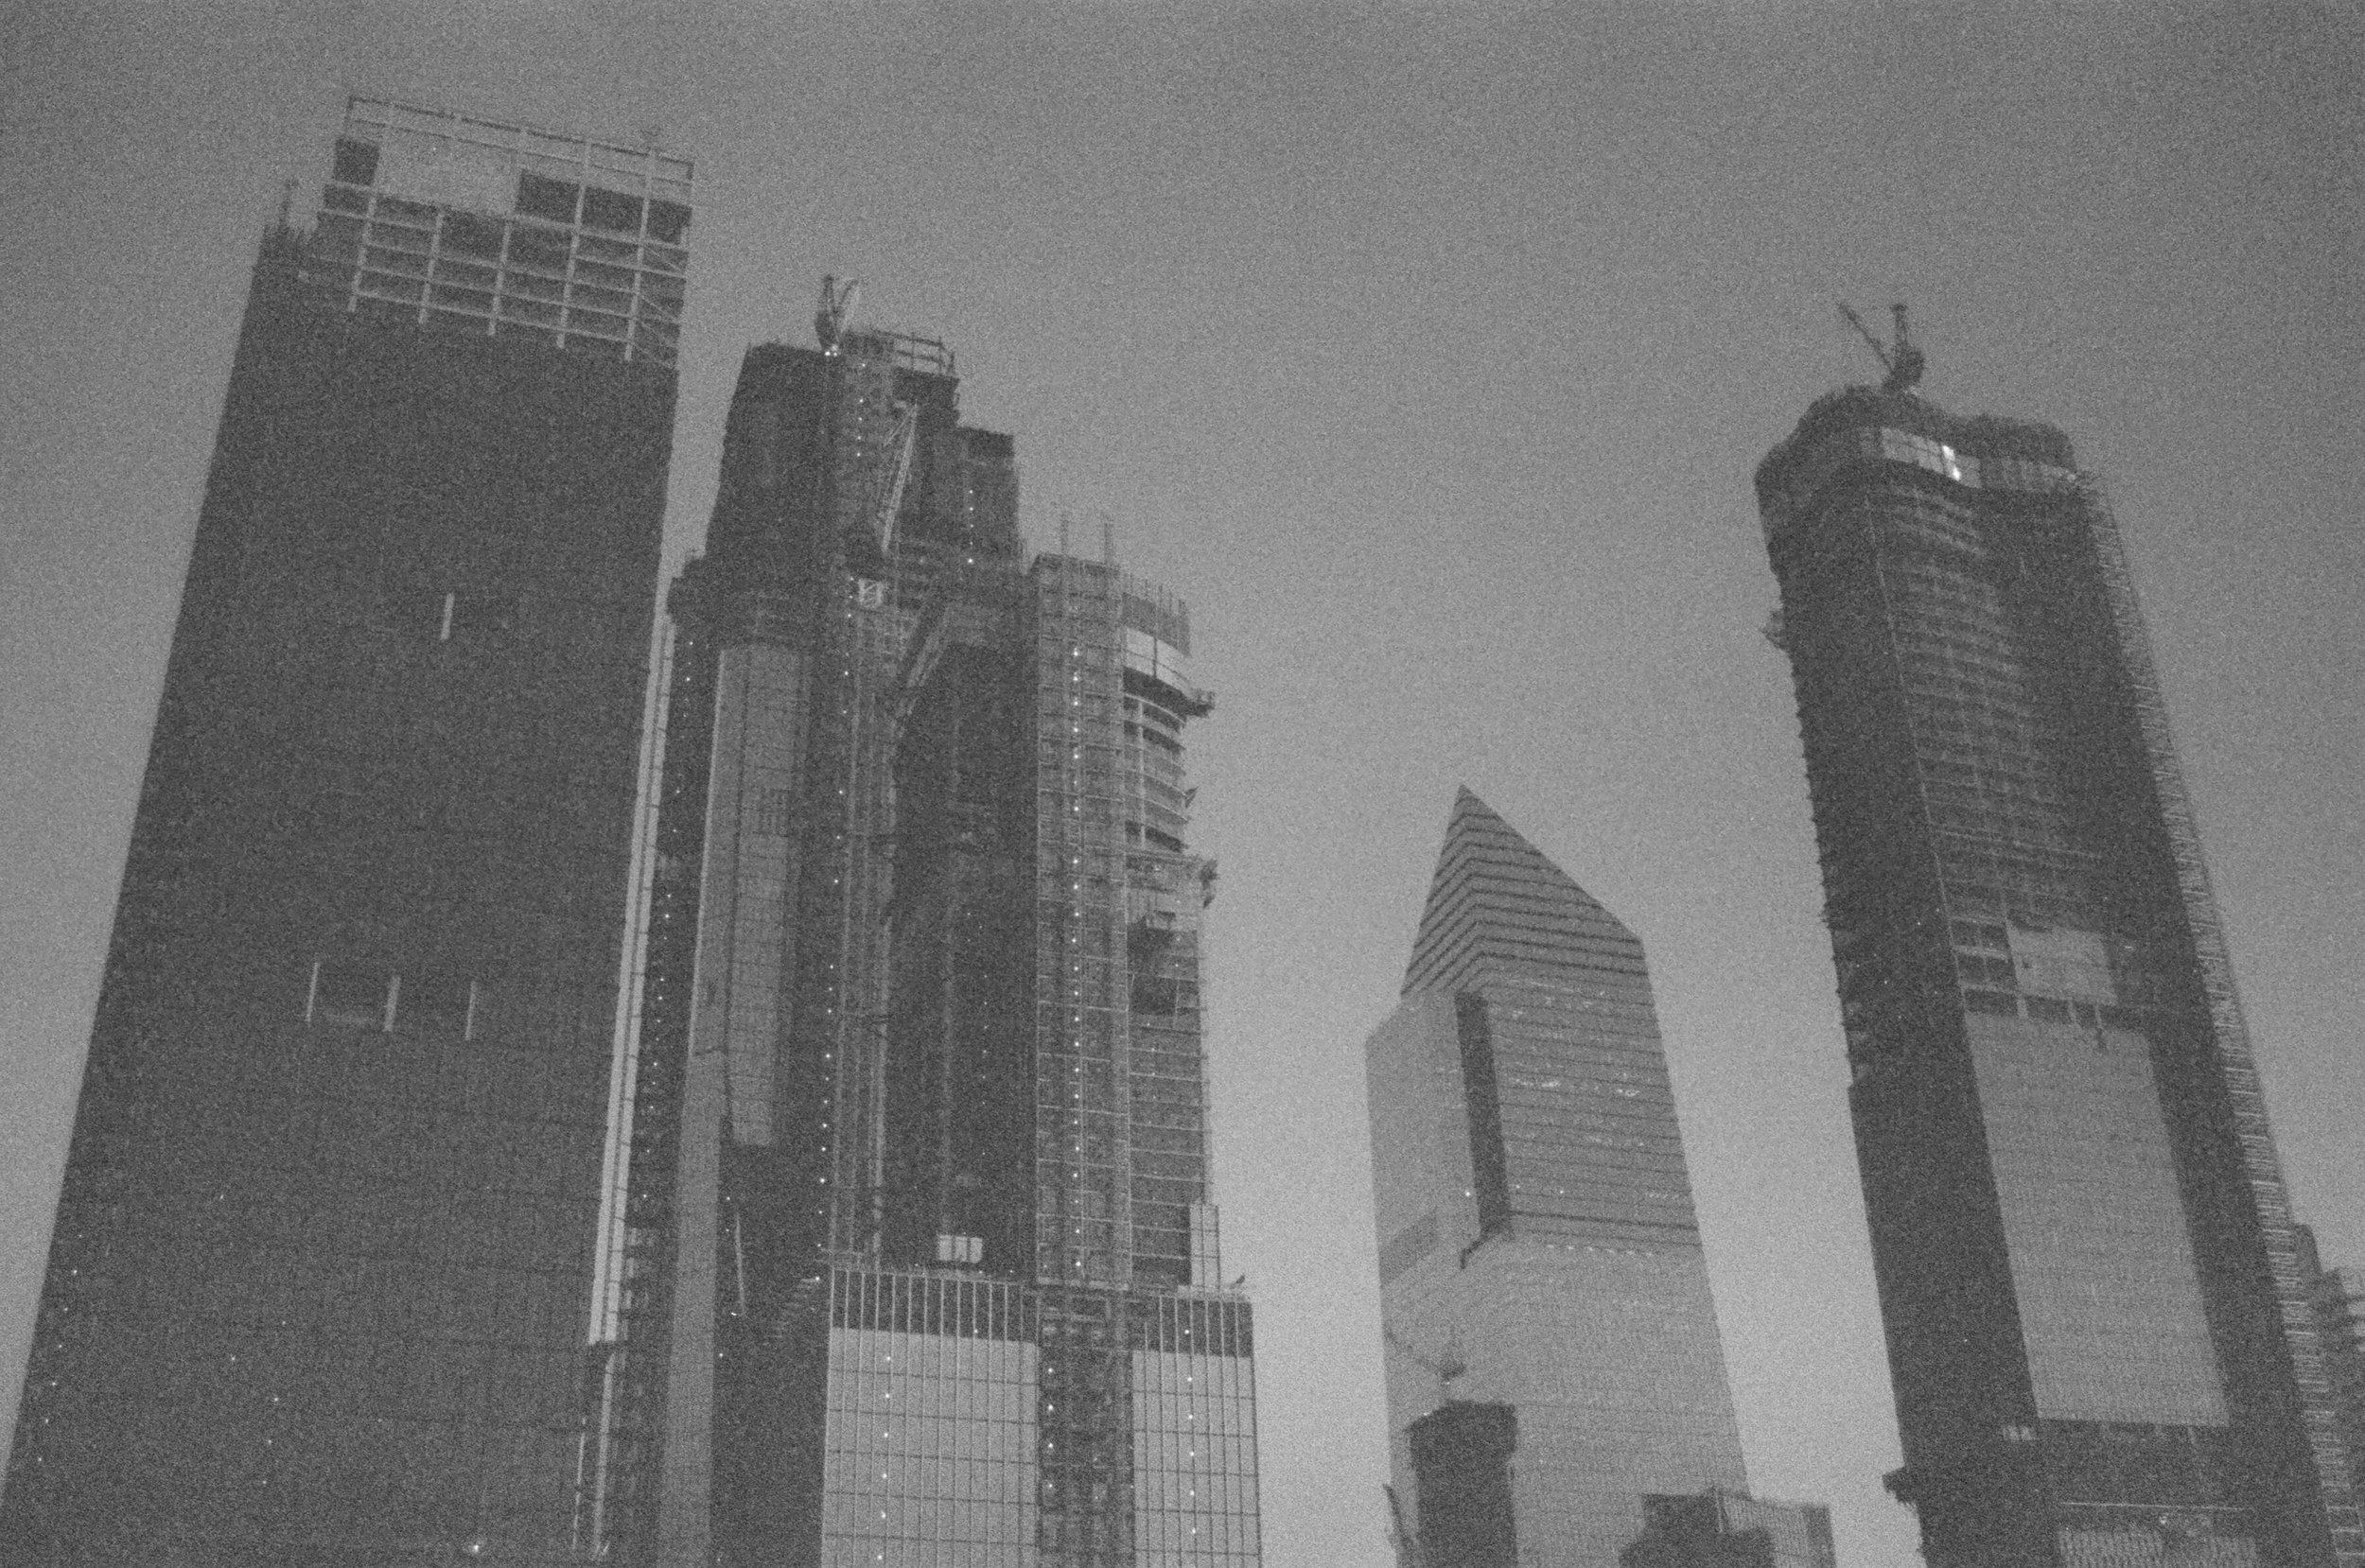 skyline-20840023.jpg